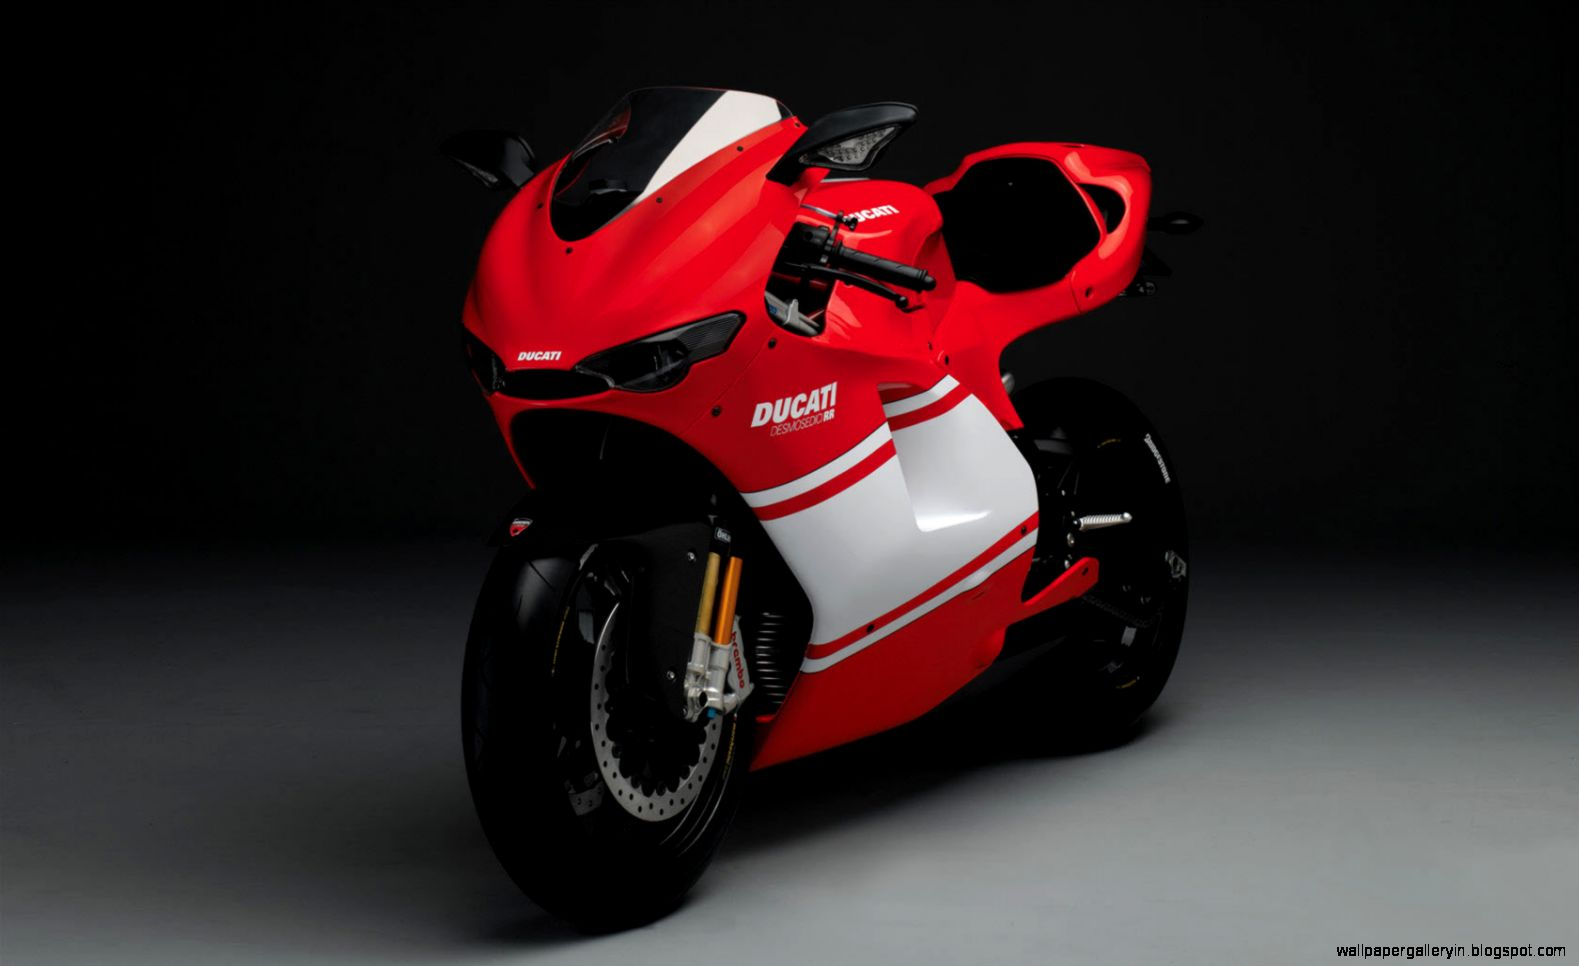 New Ducati Motorcycle Cool Wallpaper Desktop  Free High